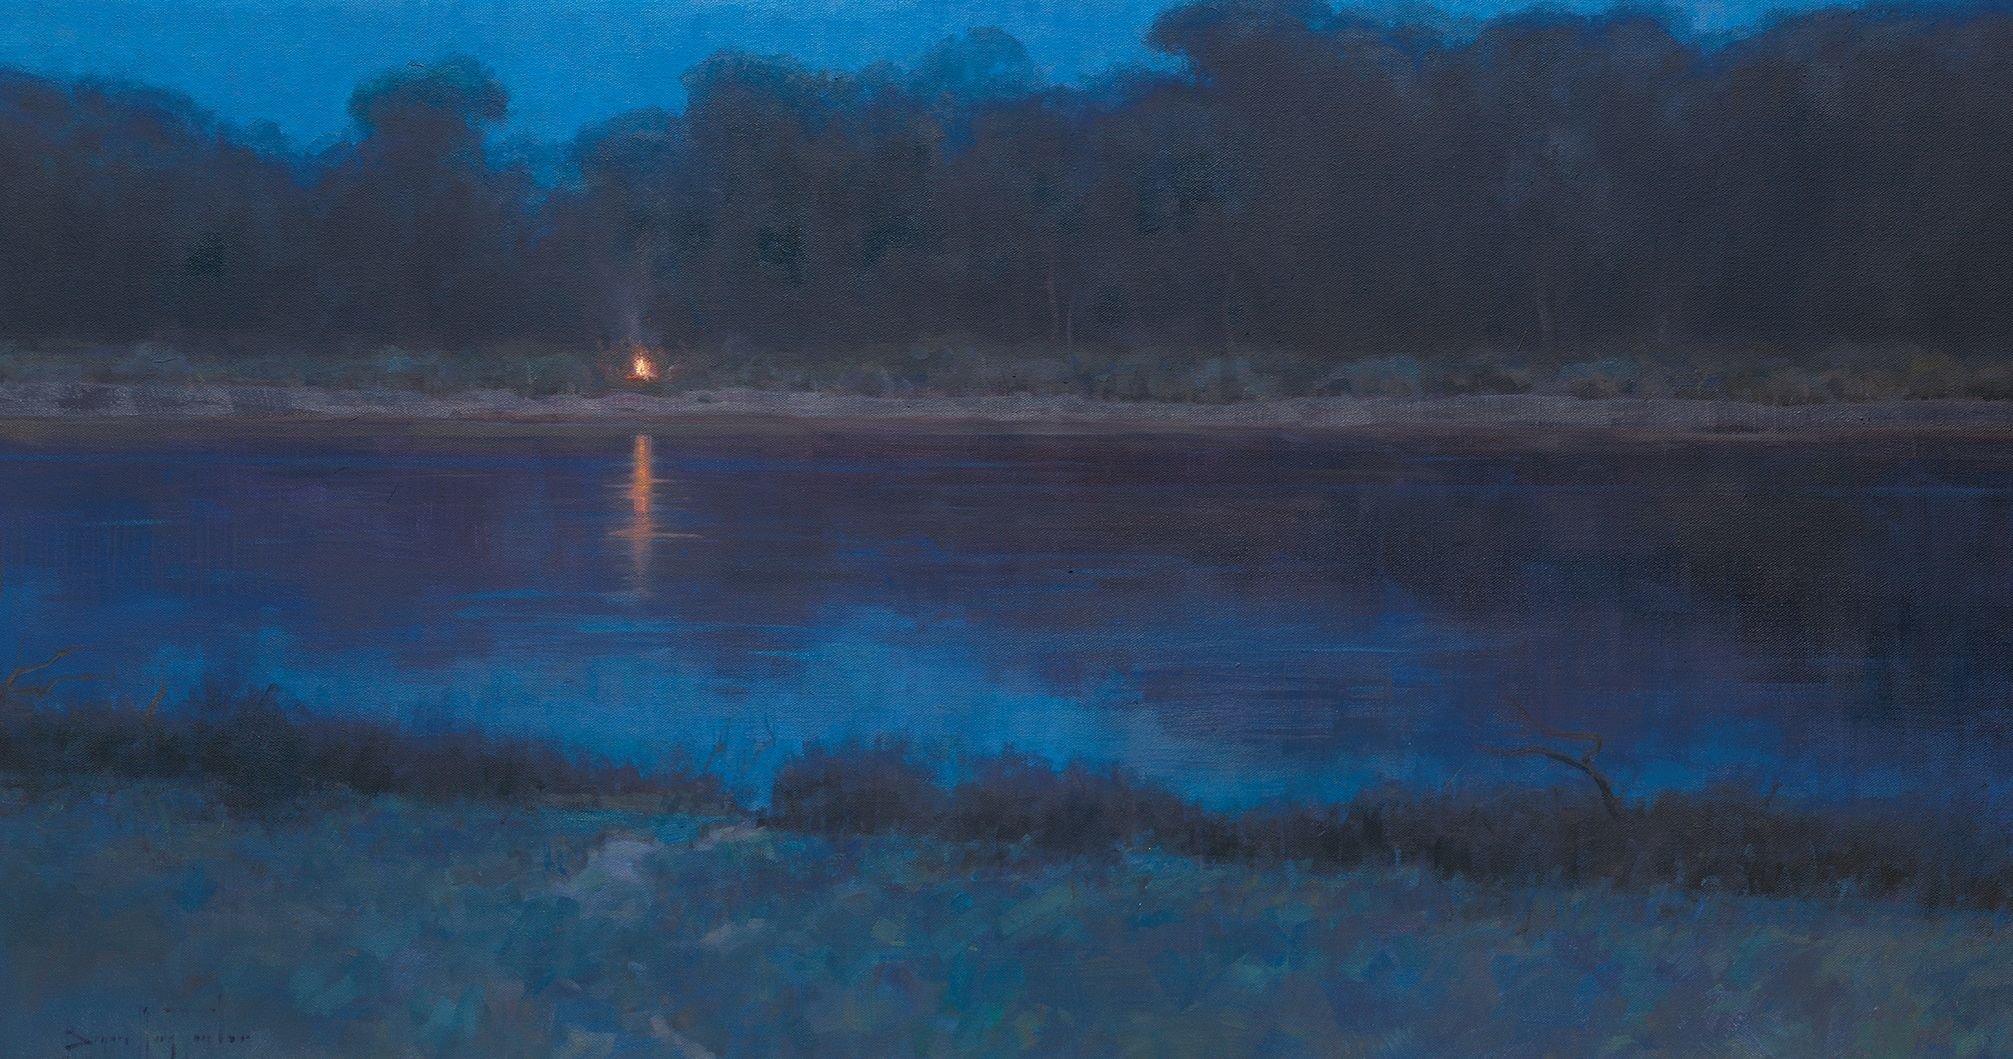 Campfire on the Missouri, by Bryan Mark Taylor. Image via Church of Jesus Christ.